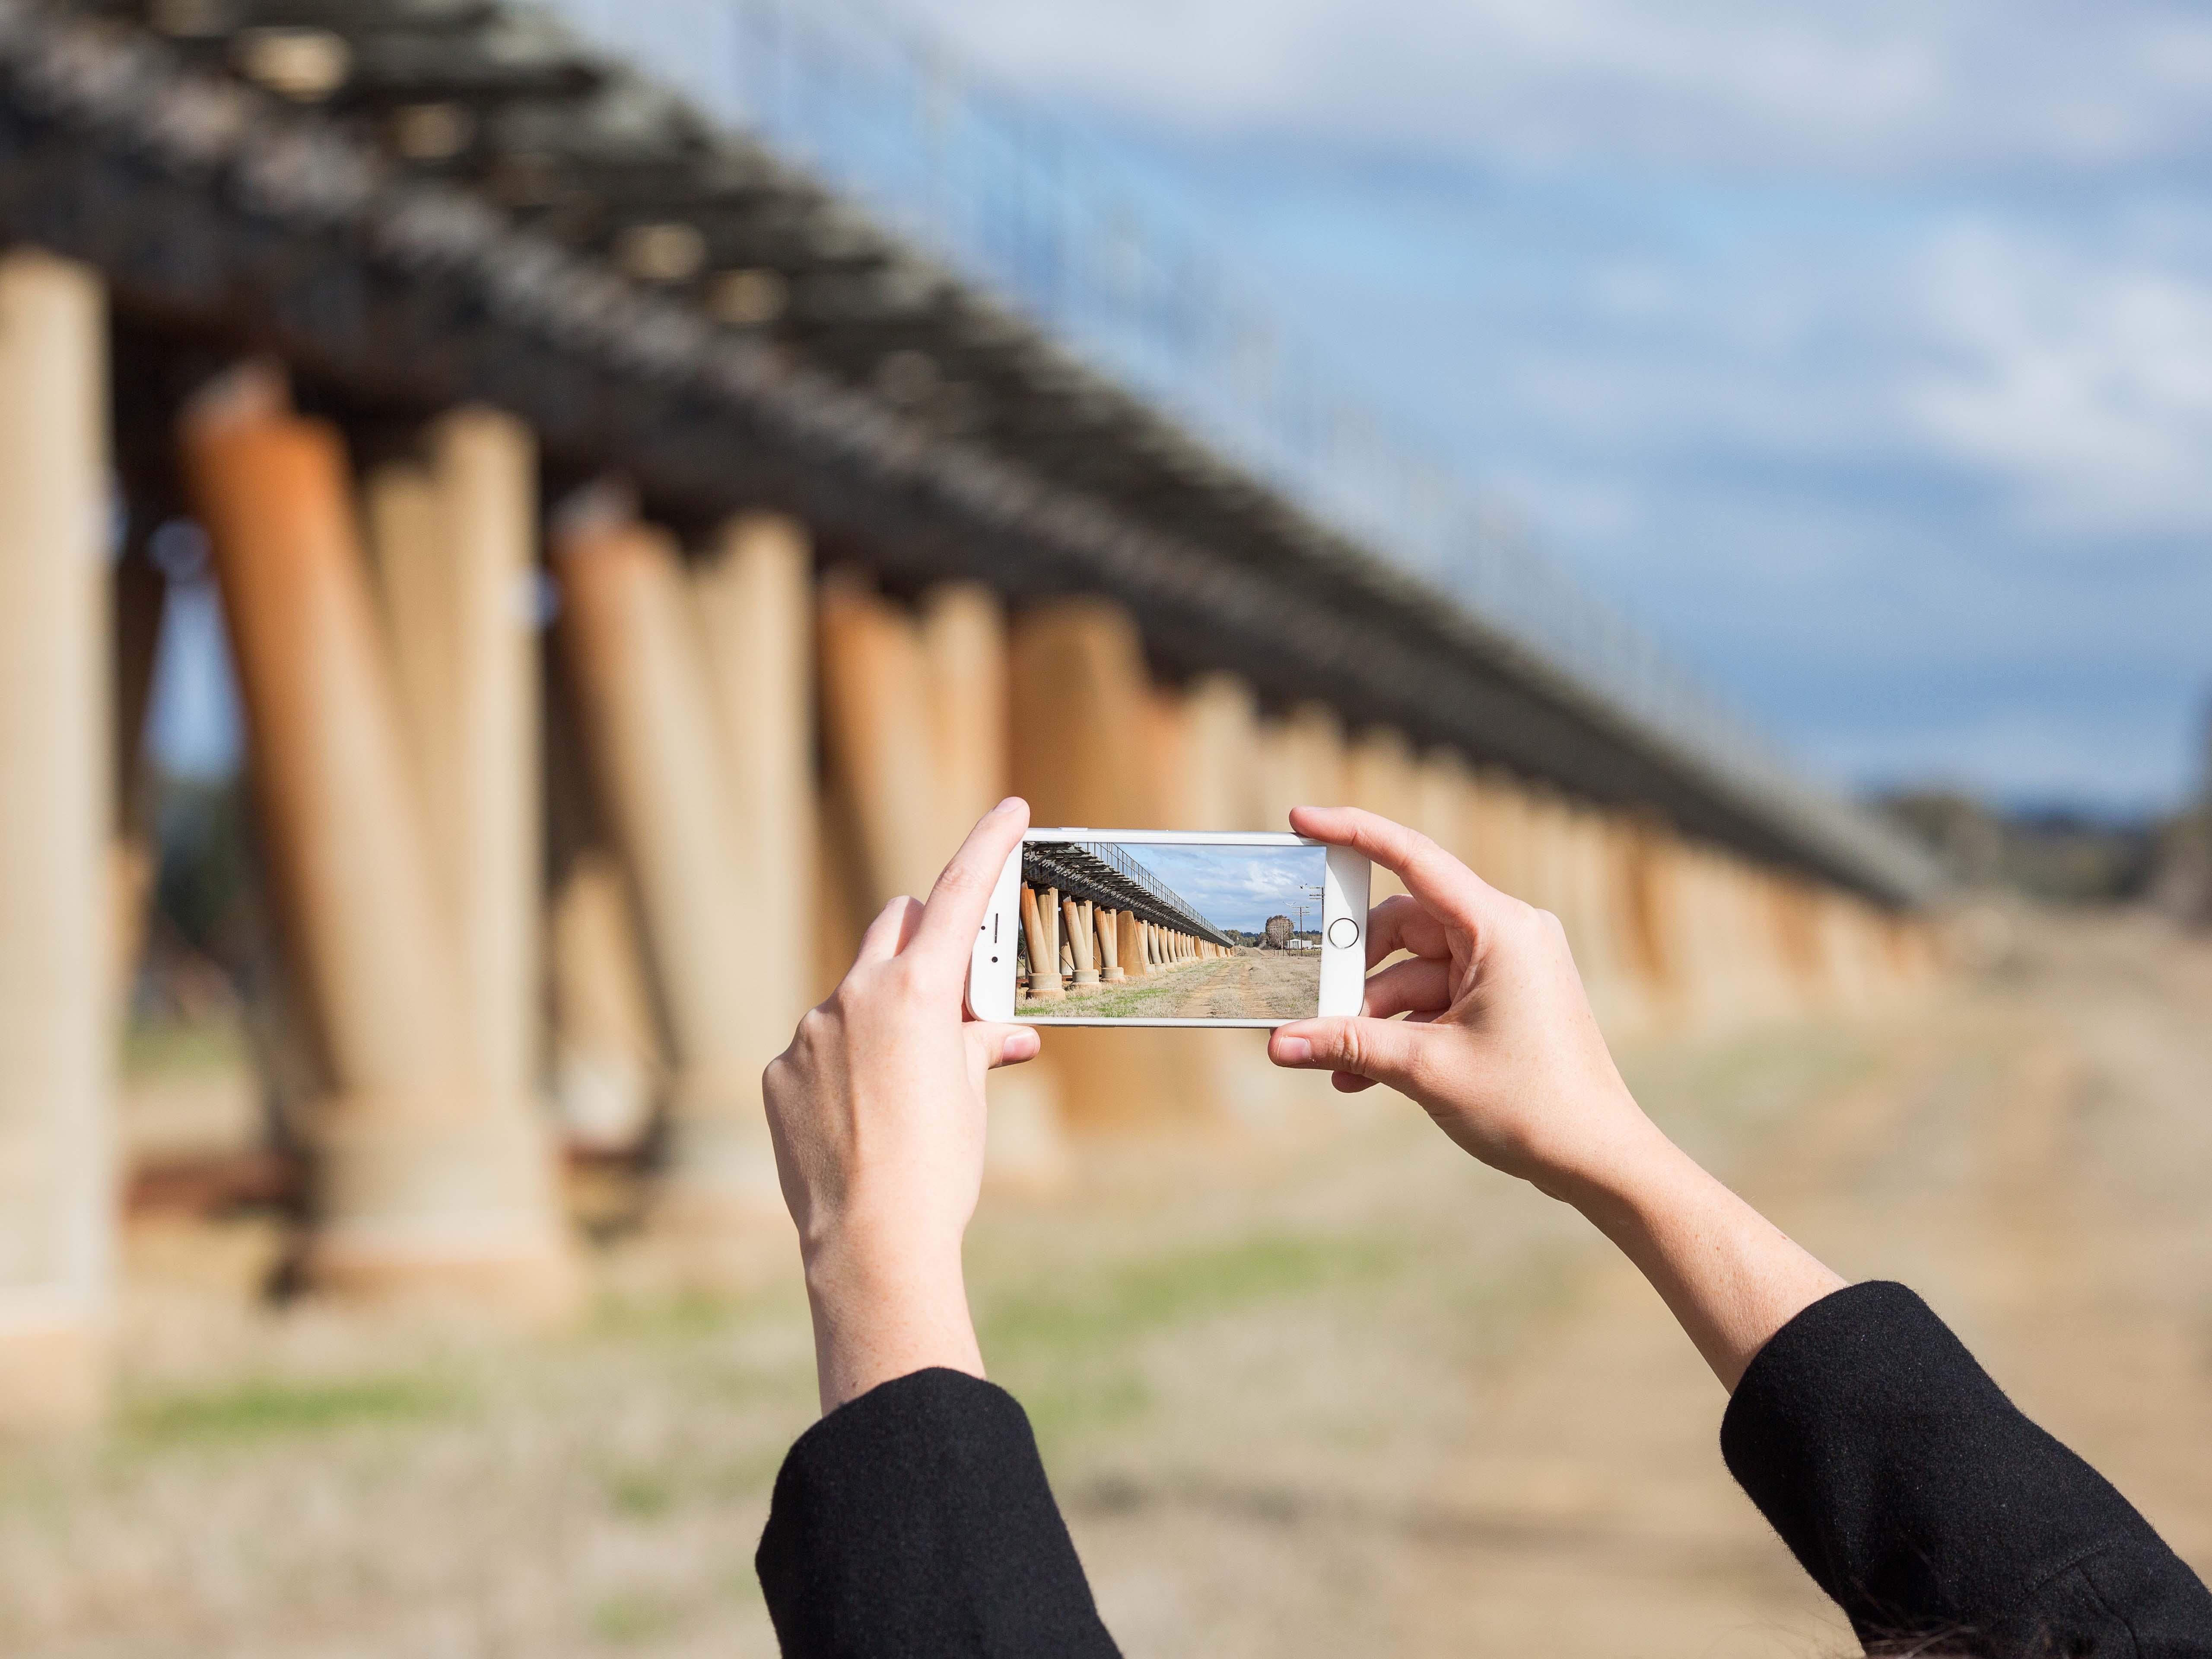 Viaduct in North Wagga